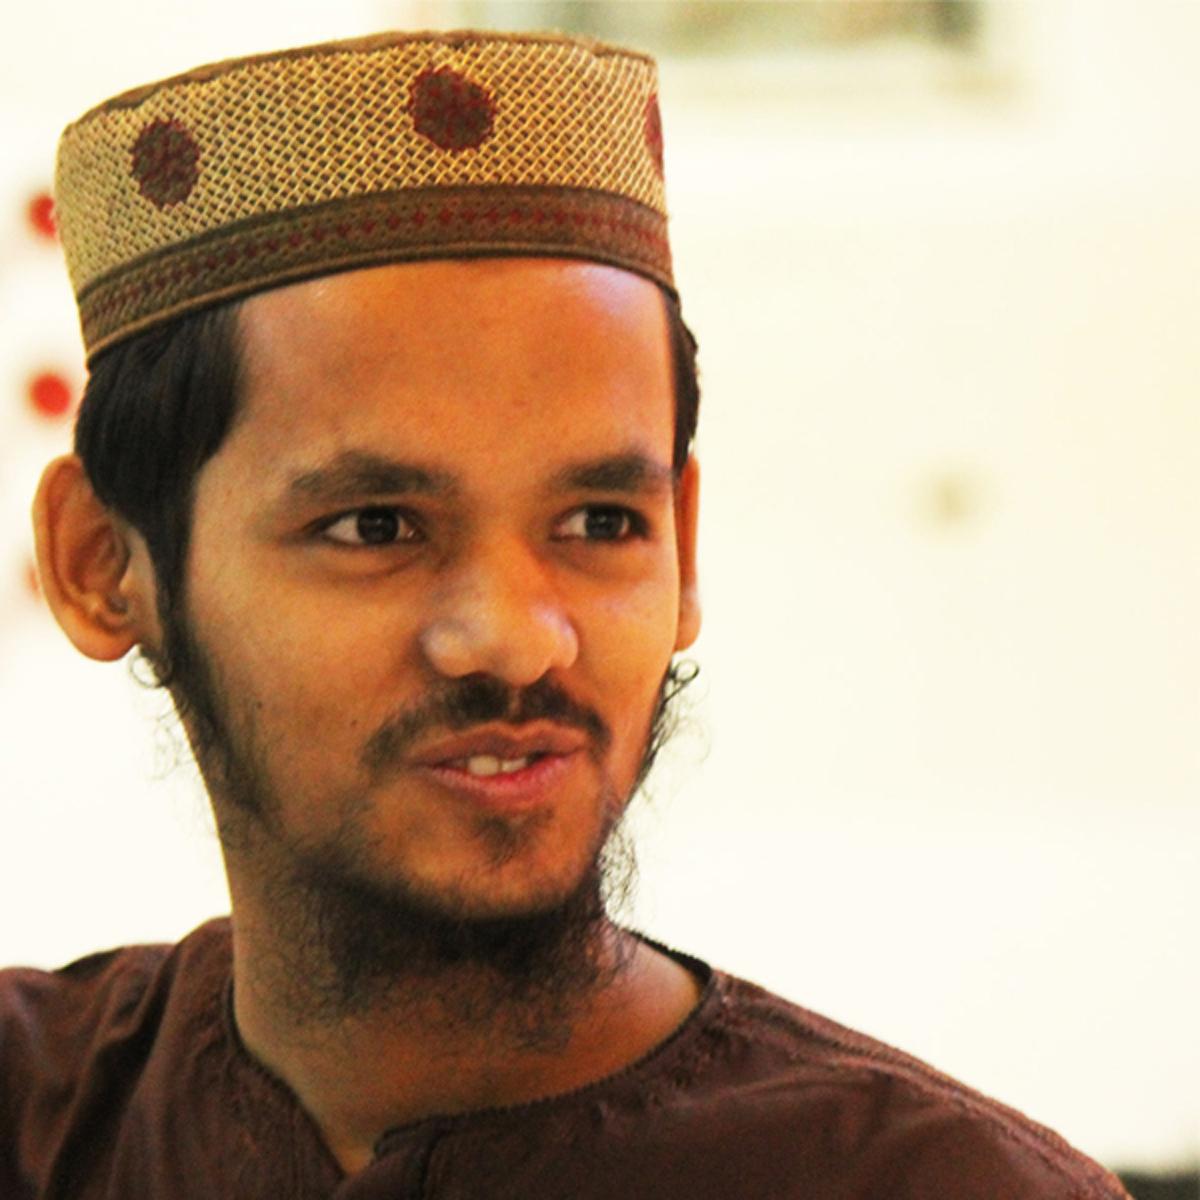 Tahmid Hassan